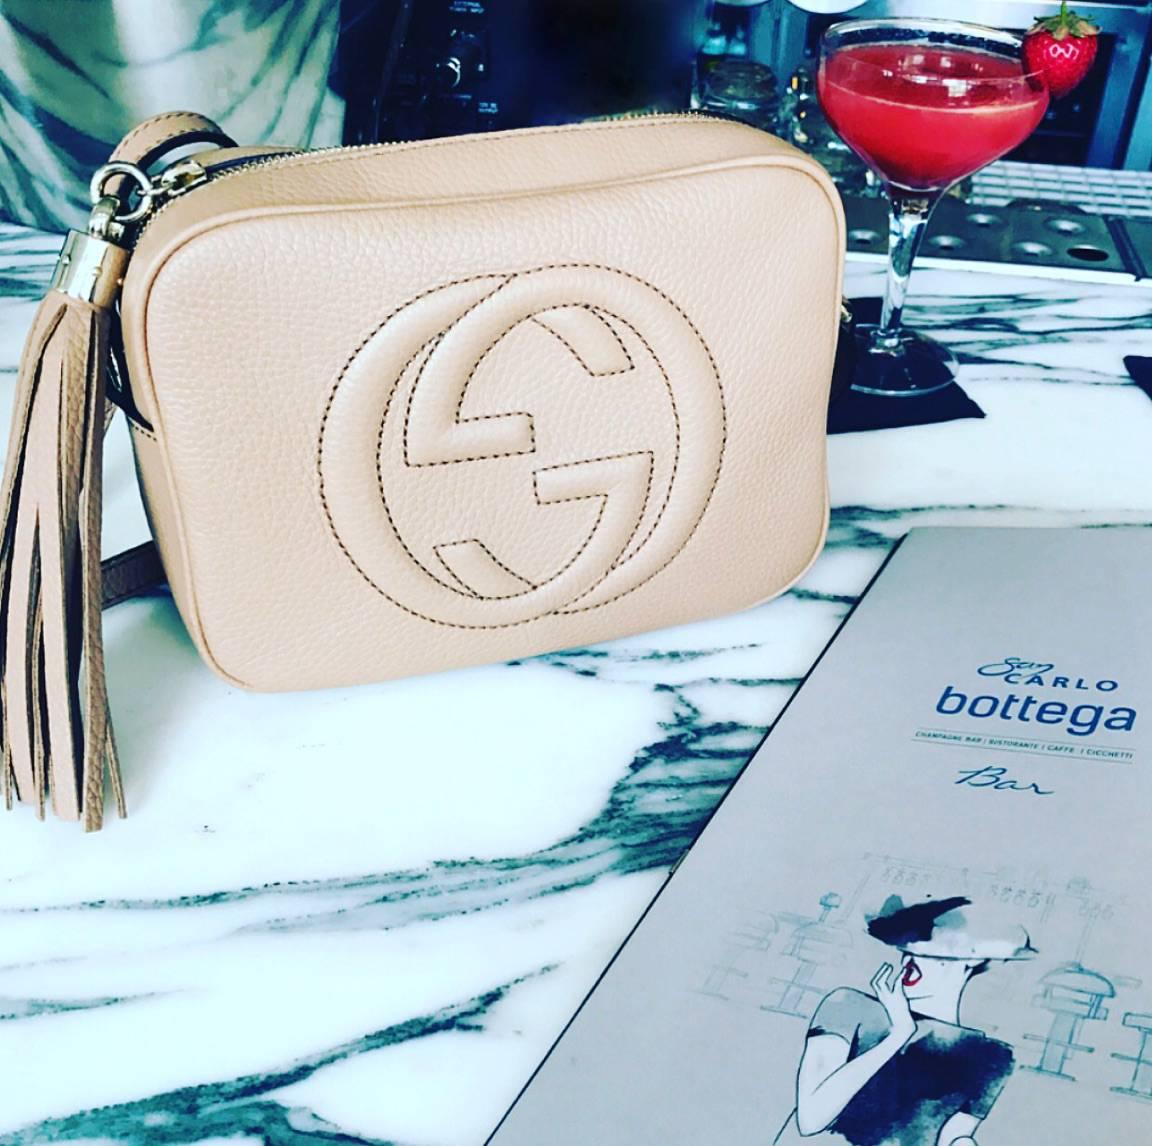 d4c7bf2a417e8 Gucci Soho Disco Handbag Unboxing - Stephanie Jayne - Beauty ...